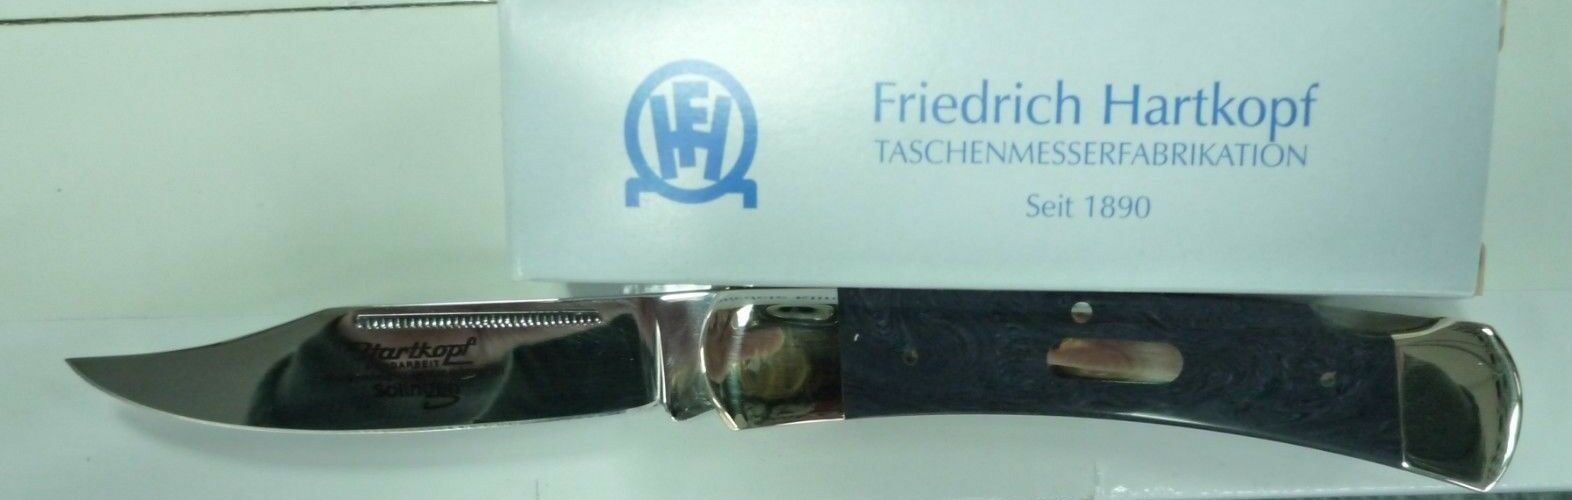 Friedrich Hartkopf Solingen Solingen Solingen Taschenmesser Sonderbeschalung JUMA 290 c8fd11